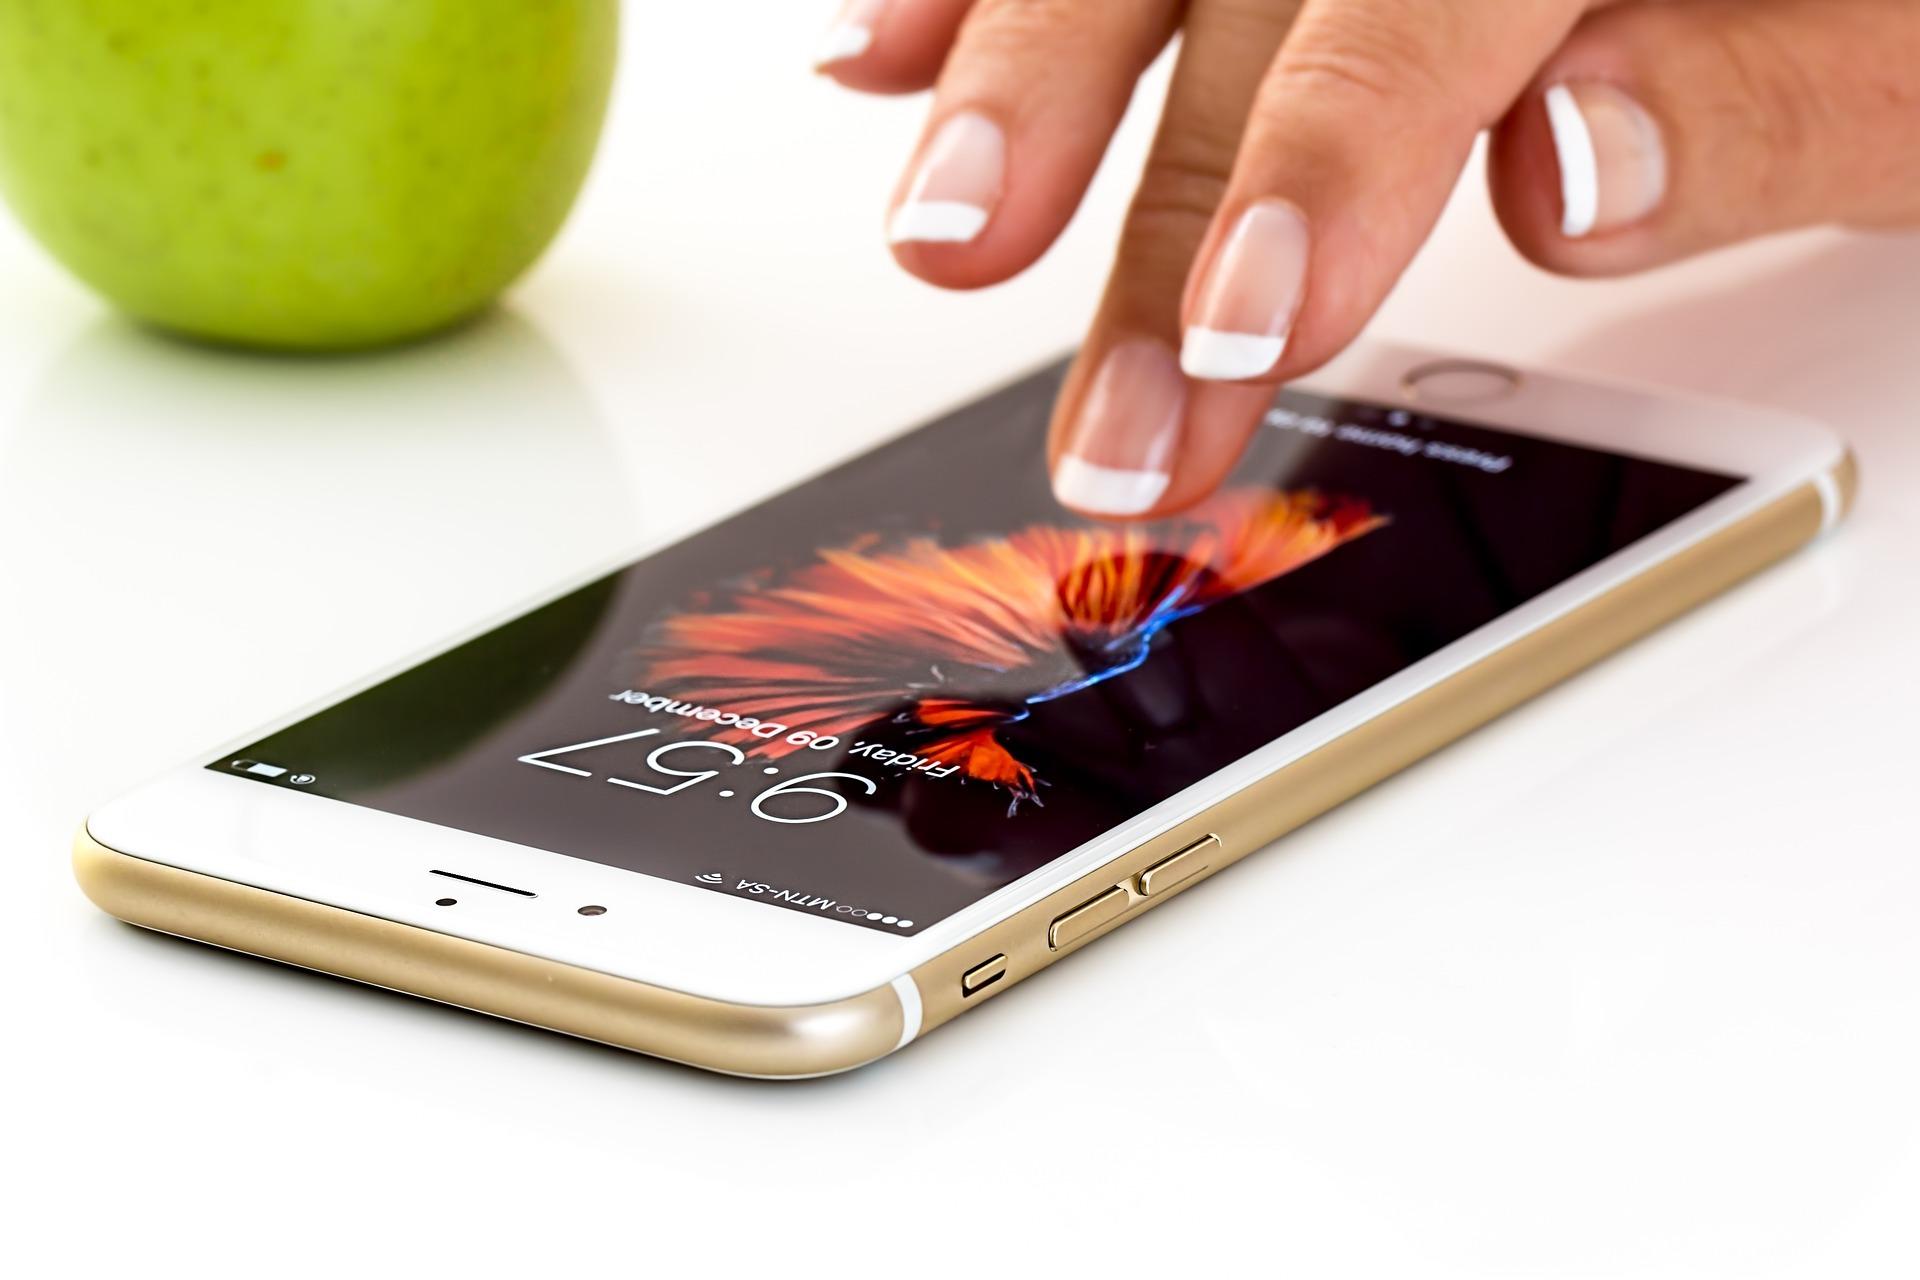 iPhone – Allroundtalent aus dem Hause Apple auf ratgeber-blogger.de